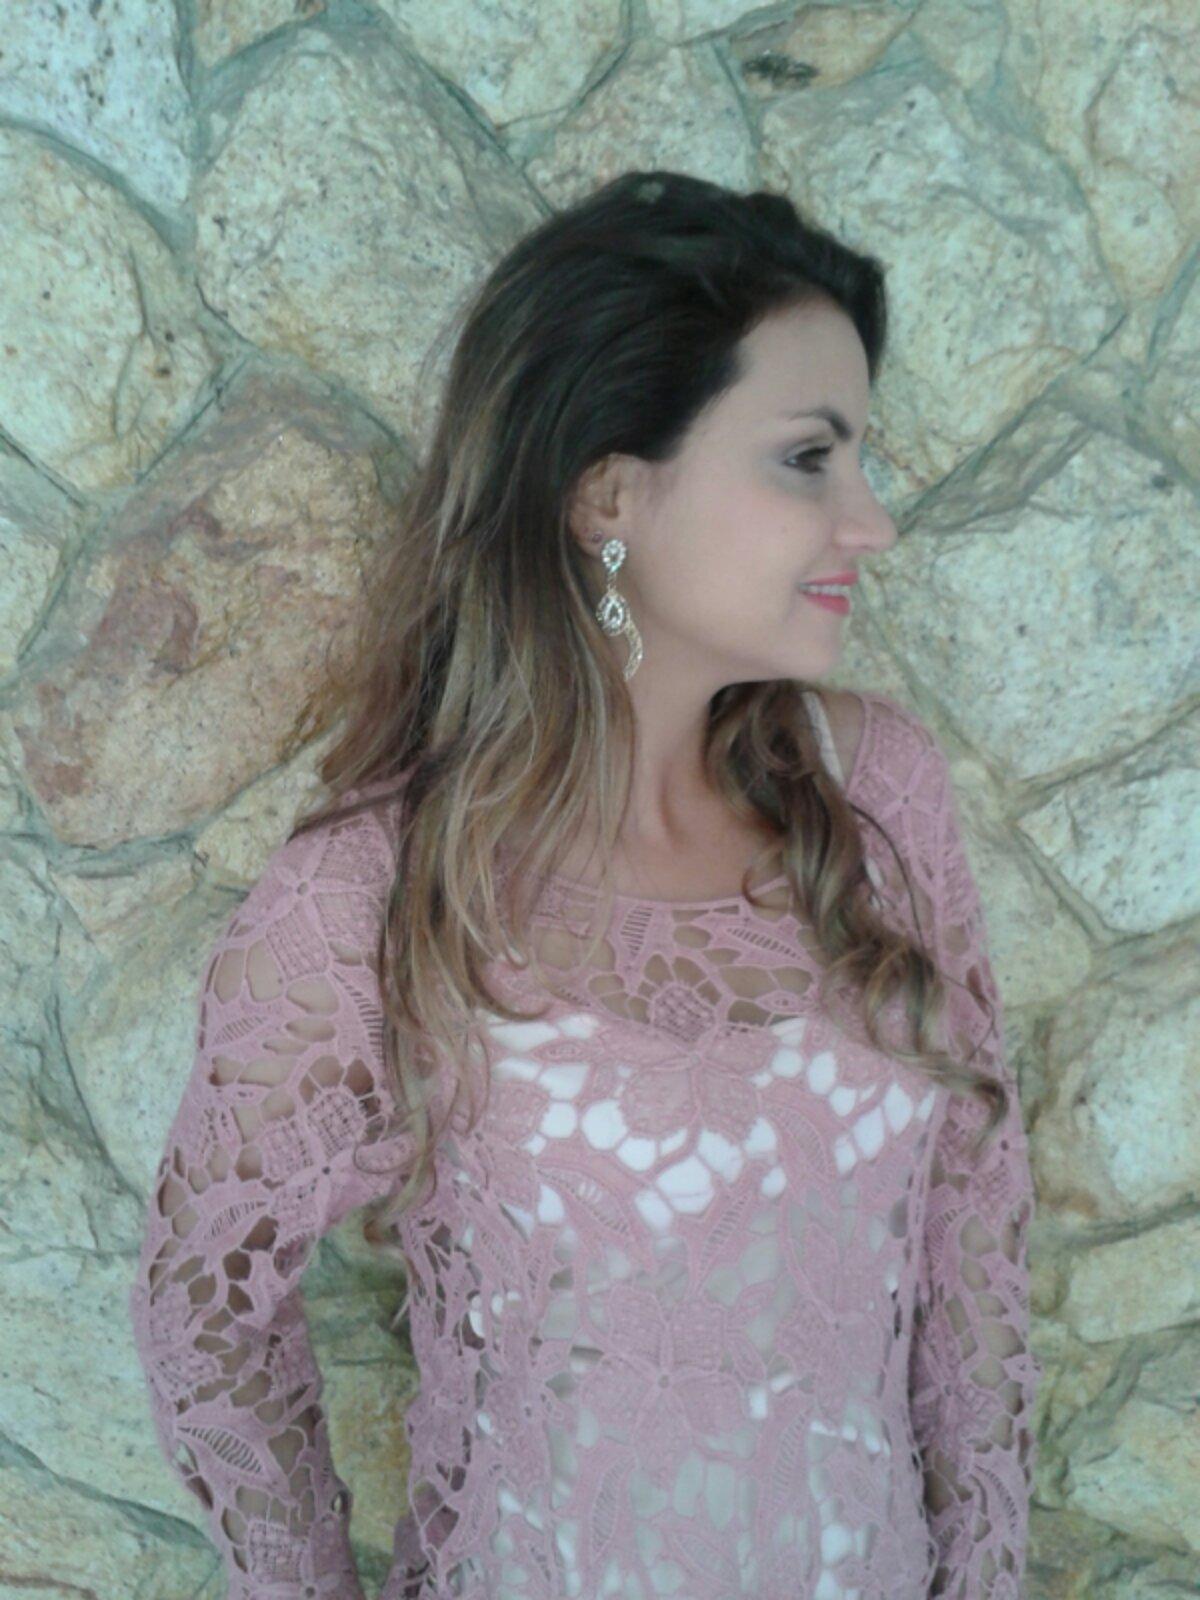 wpid-20131124_150308 Look de domingo blusa de renda + calca resignada